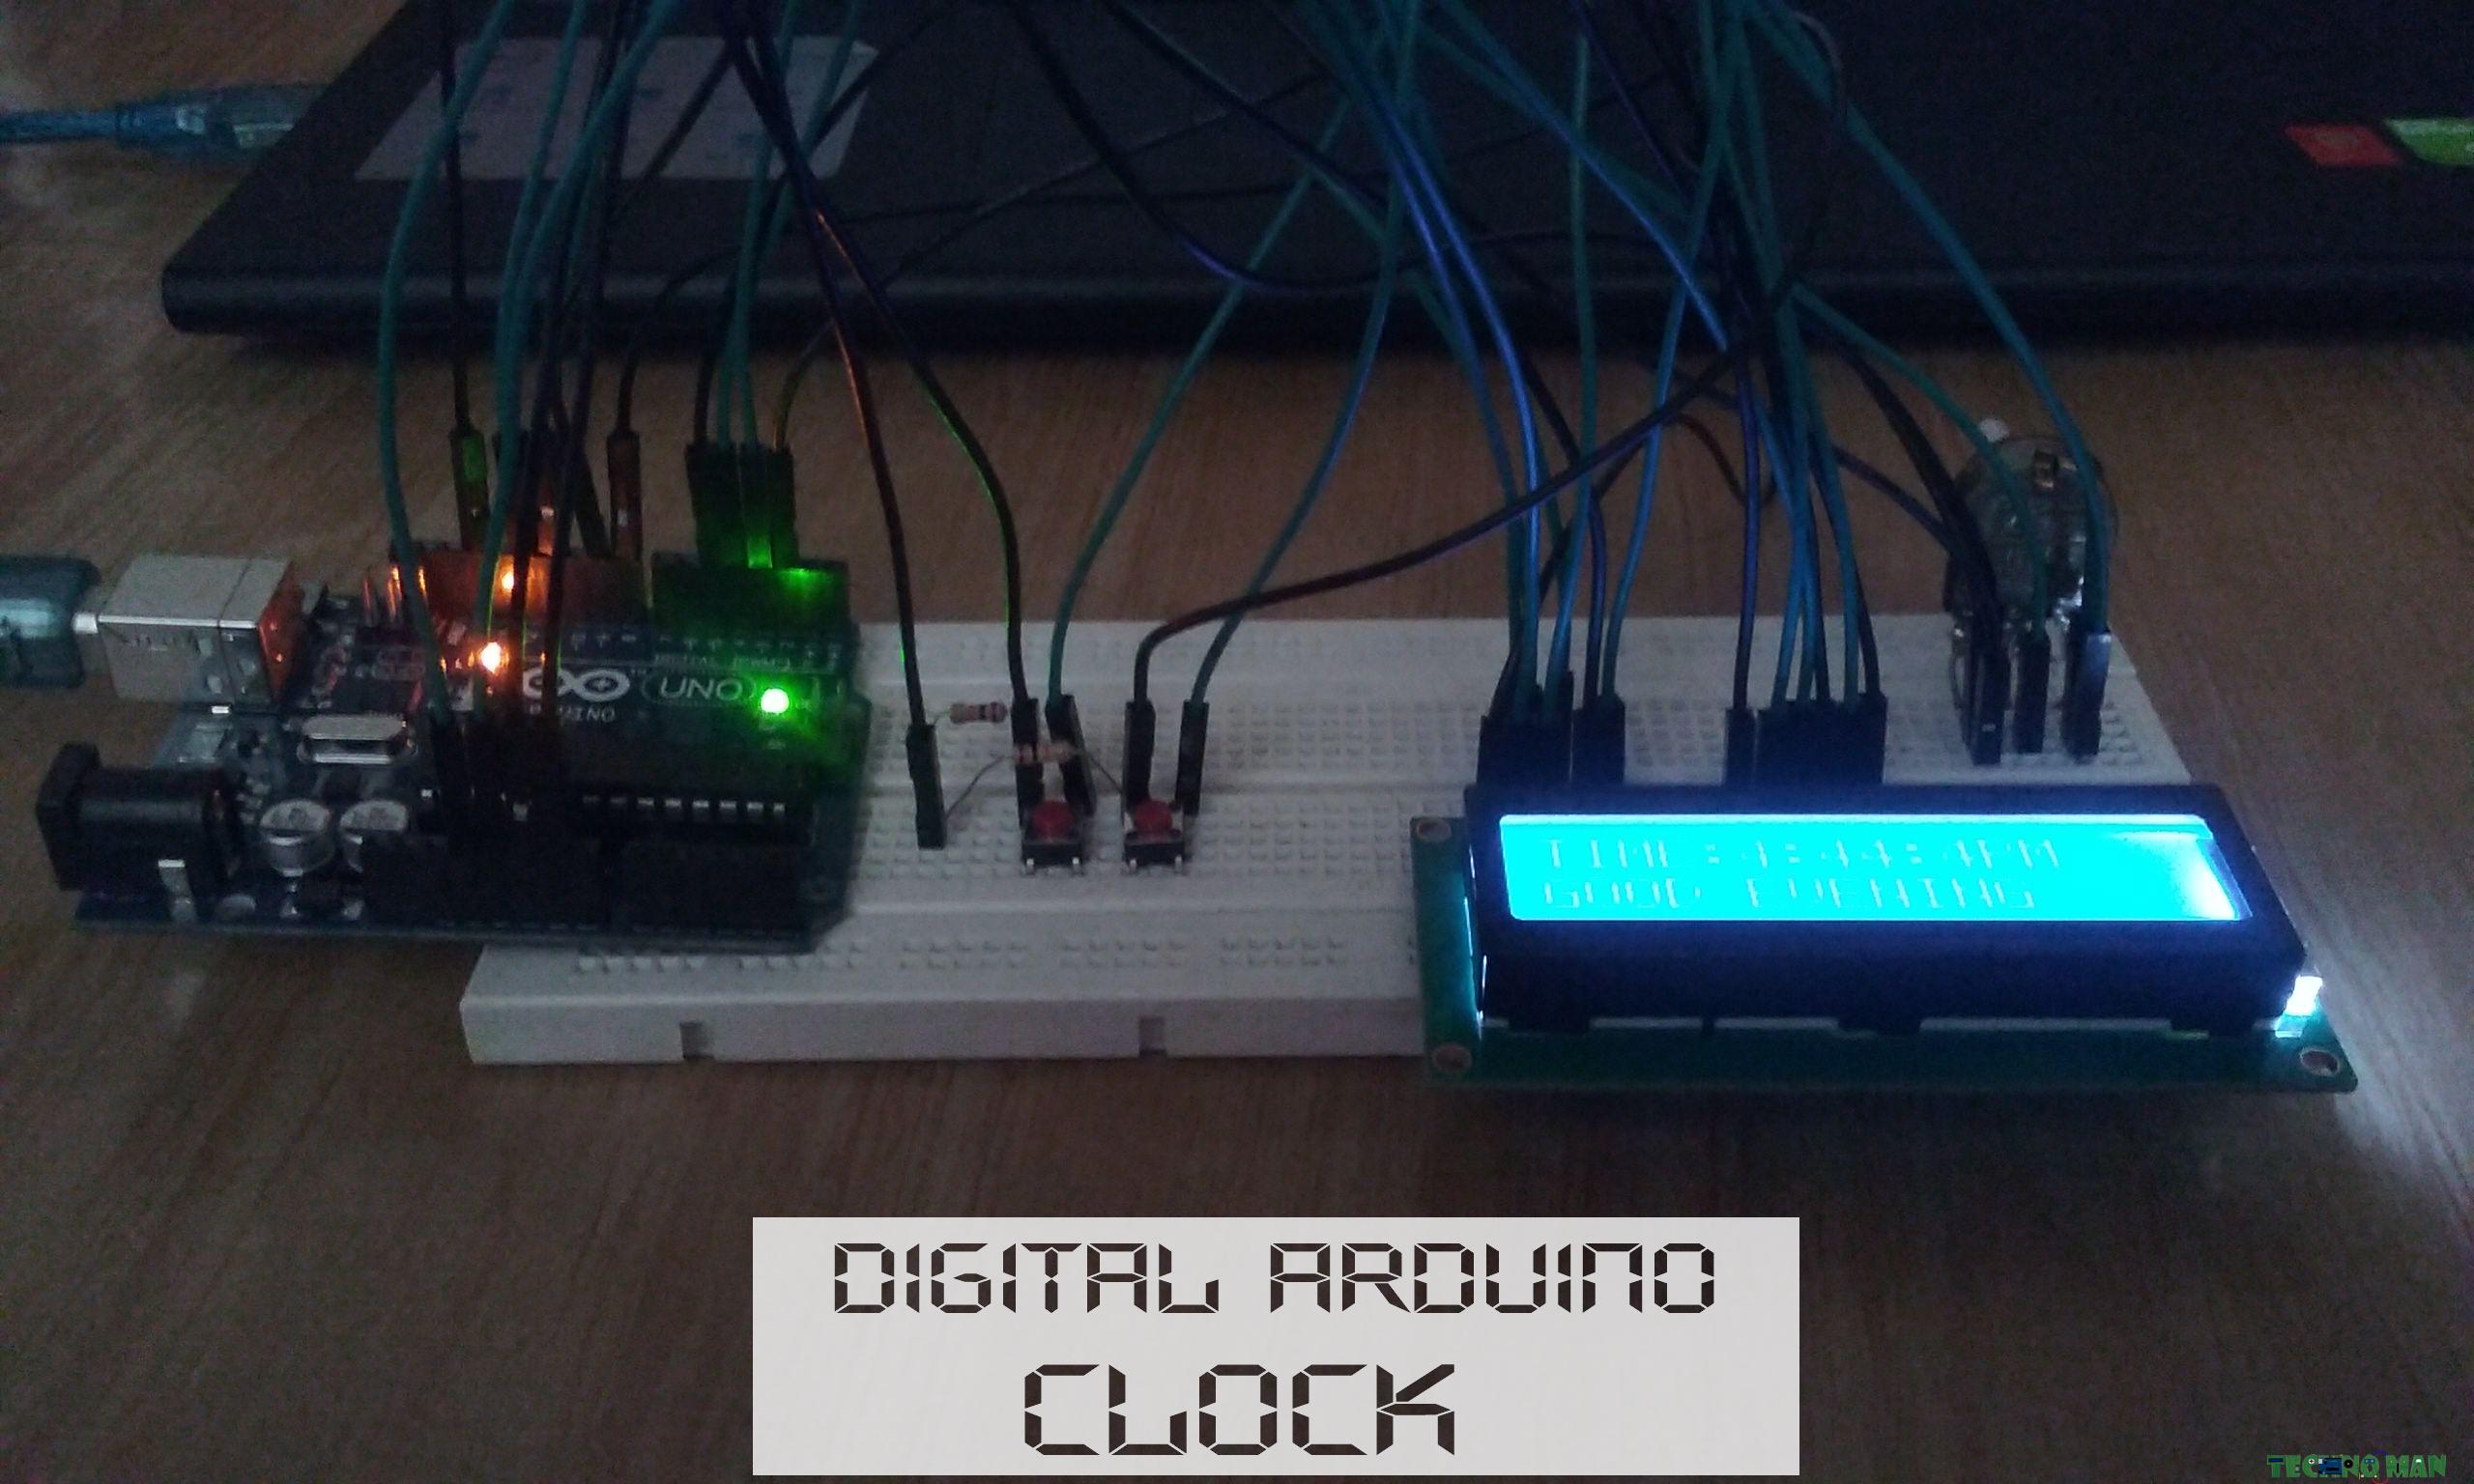 Digital Circuit Simulation Of 24 Hrs Clock Youtube